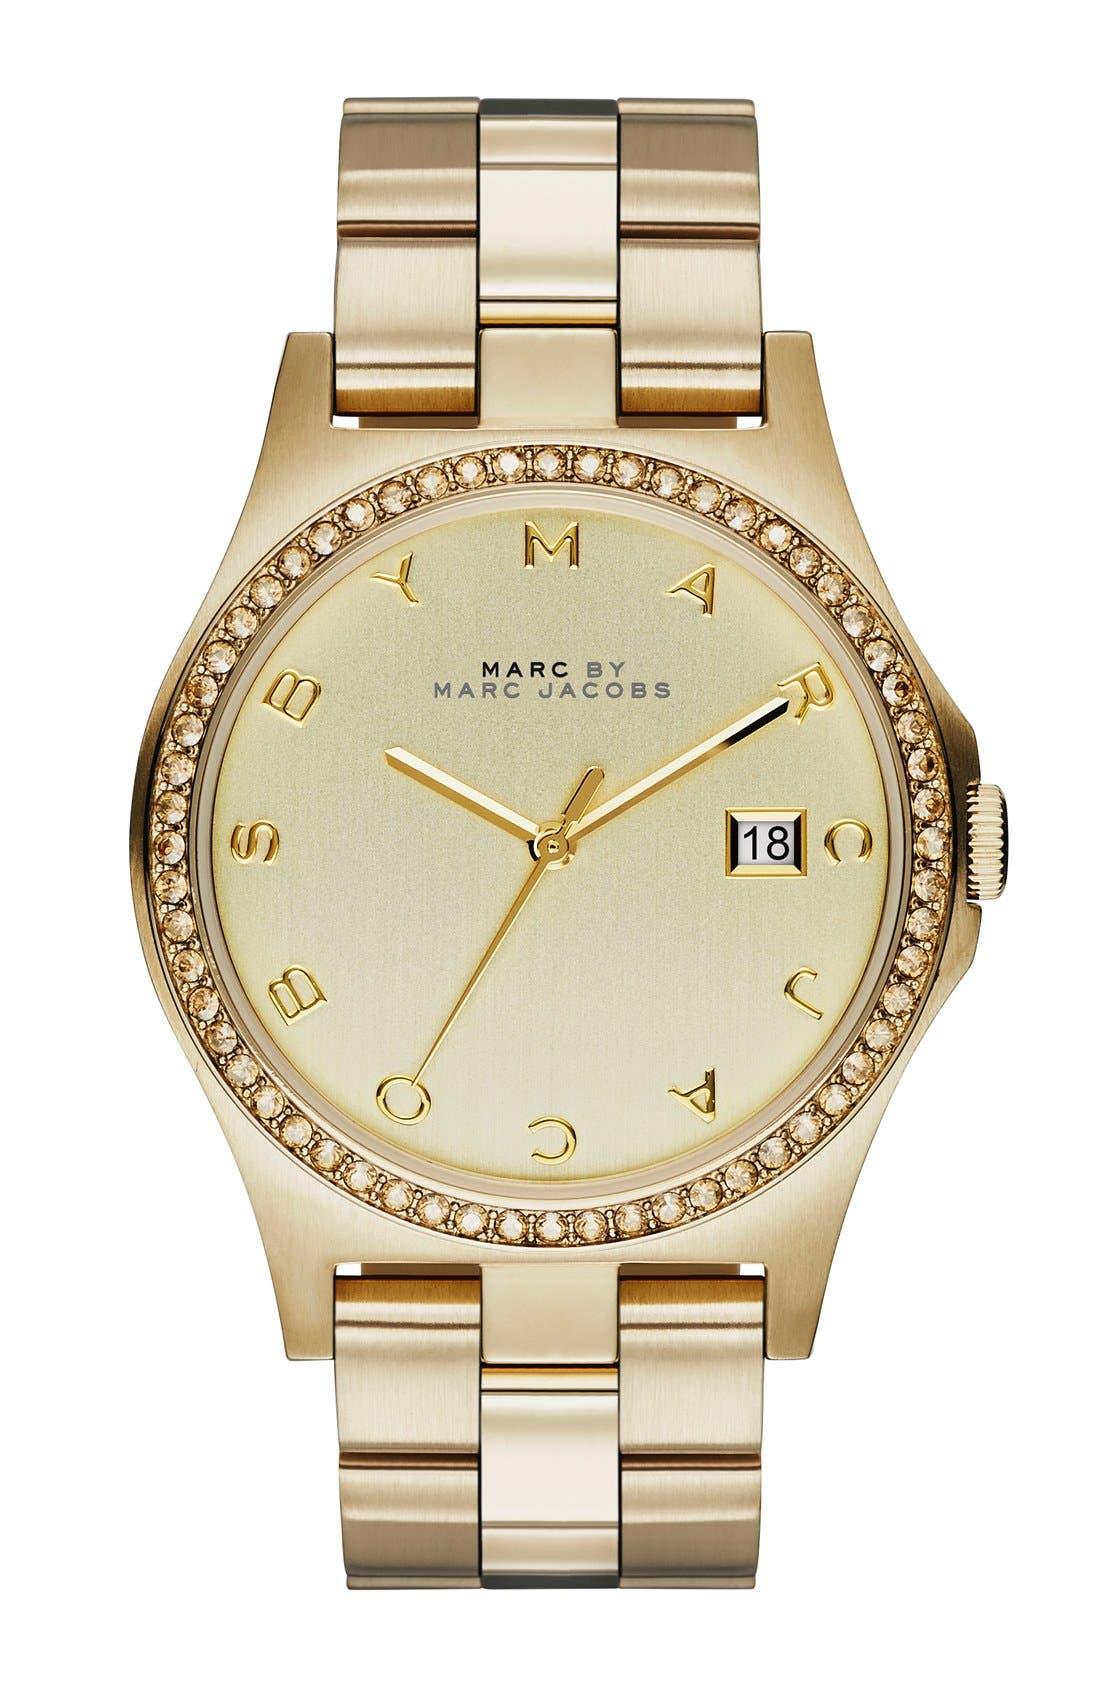 Main Image - MARC BY MARC JACOBS 'Henry' Crystal Bezel Bracelet Watch, 40mm